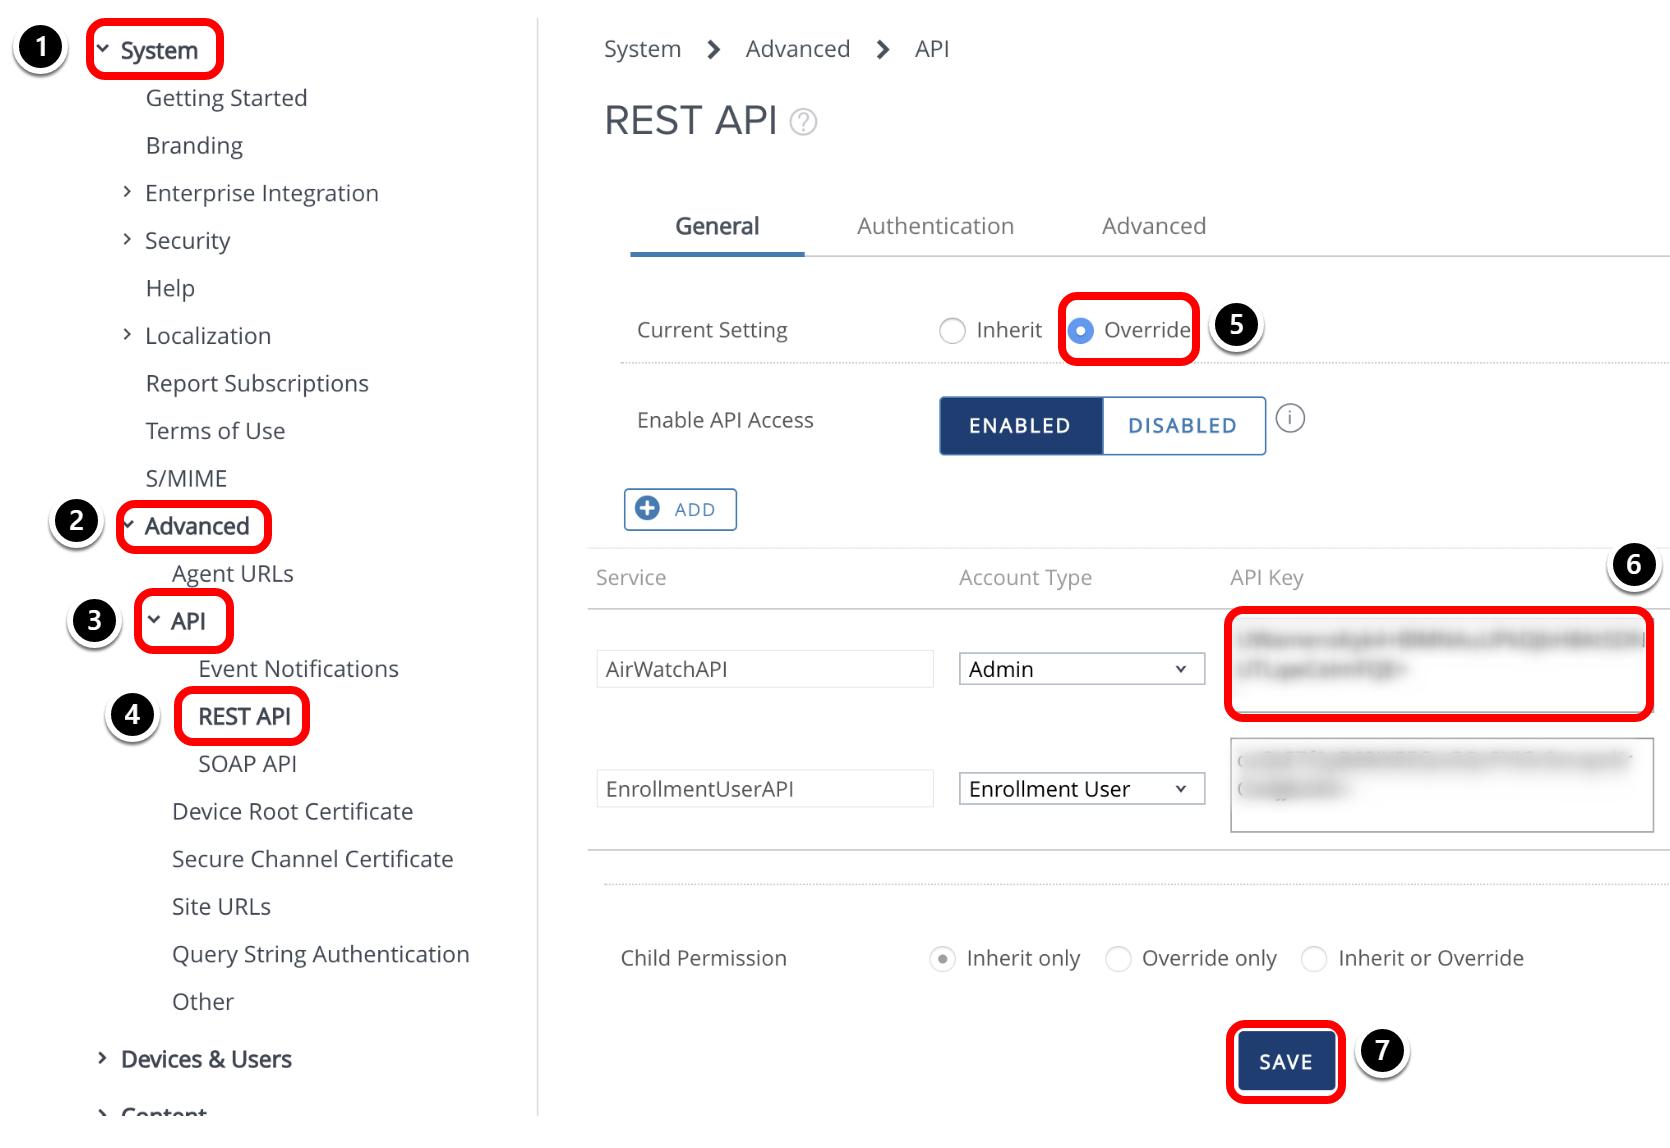 Obtaining REST API Key (workspace one intelligence documentation, workspace one intelligence docs, change dashboard windows 10, intelligence reporting)